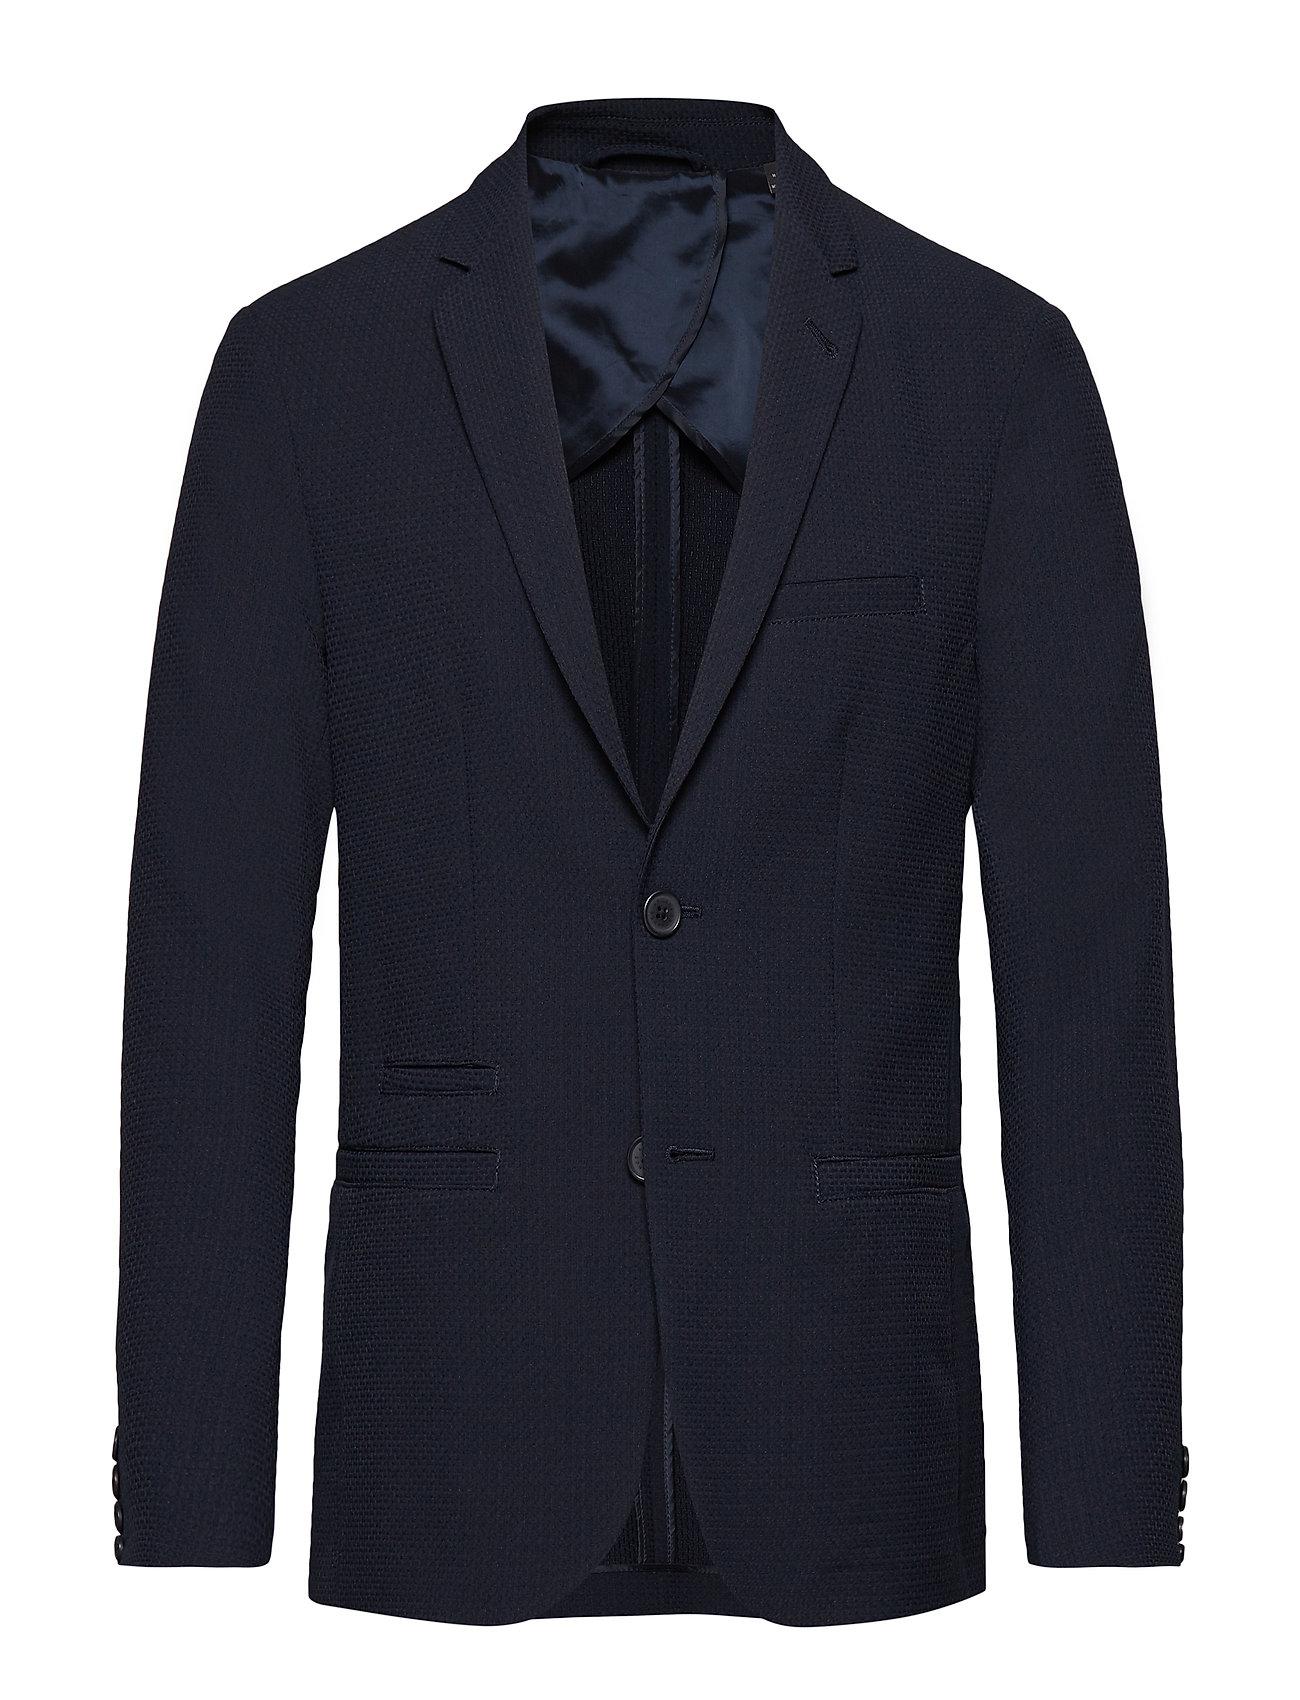 ARMANI EXCHANGE Man Woven Blazer Blazer Jackett Blau ARMANI EXCHANGE